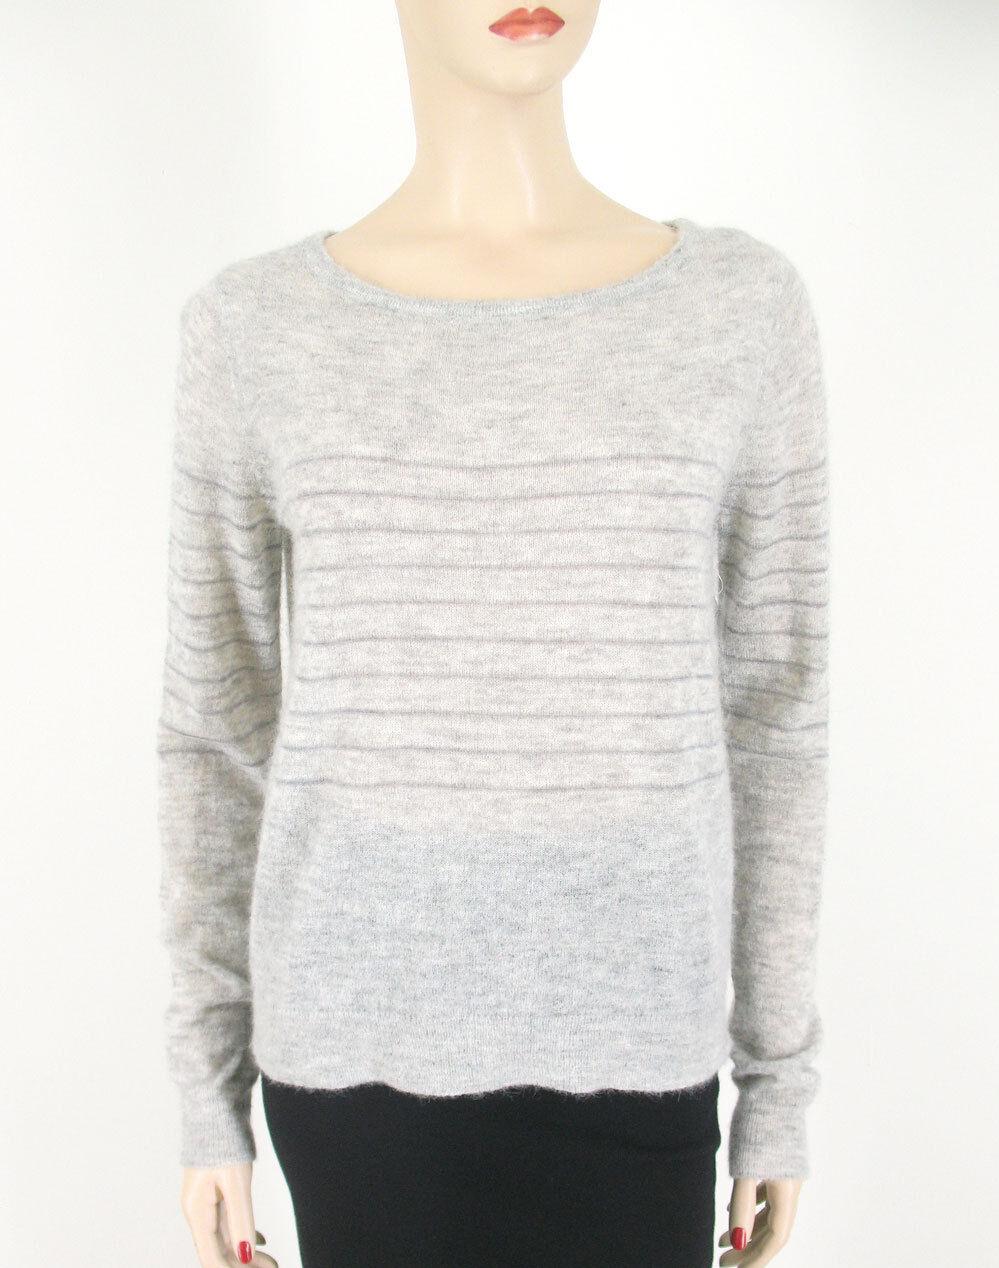 Paige Denim Nikita Sweater Striped Striped Striped Heather Grey Baby Alpaca Wool M  219 9125 1162bc